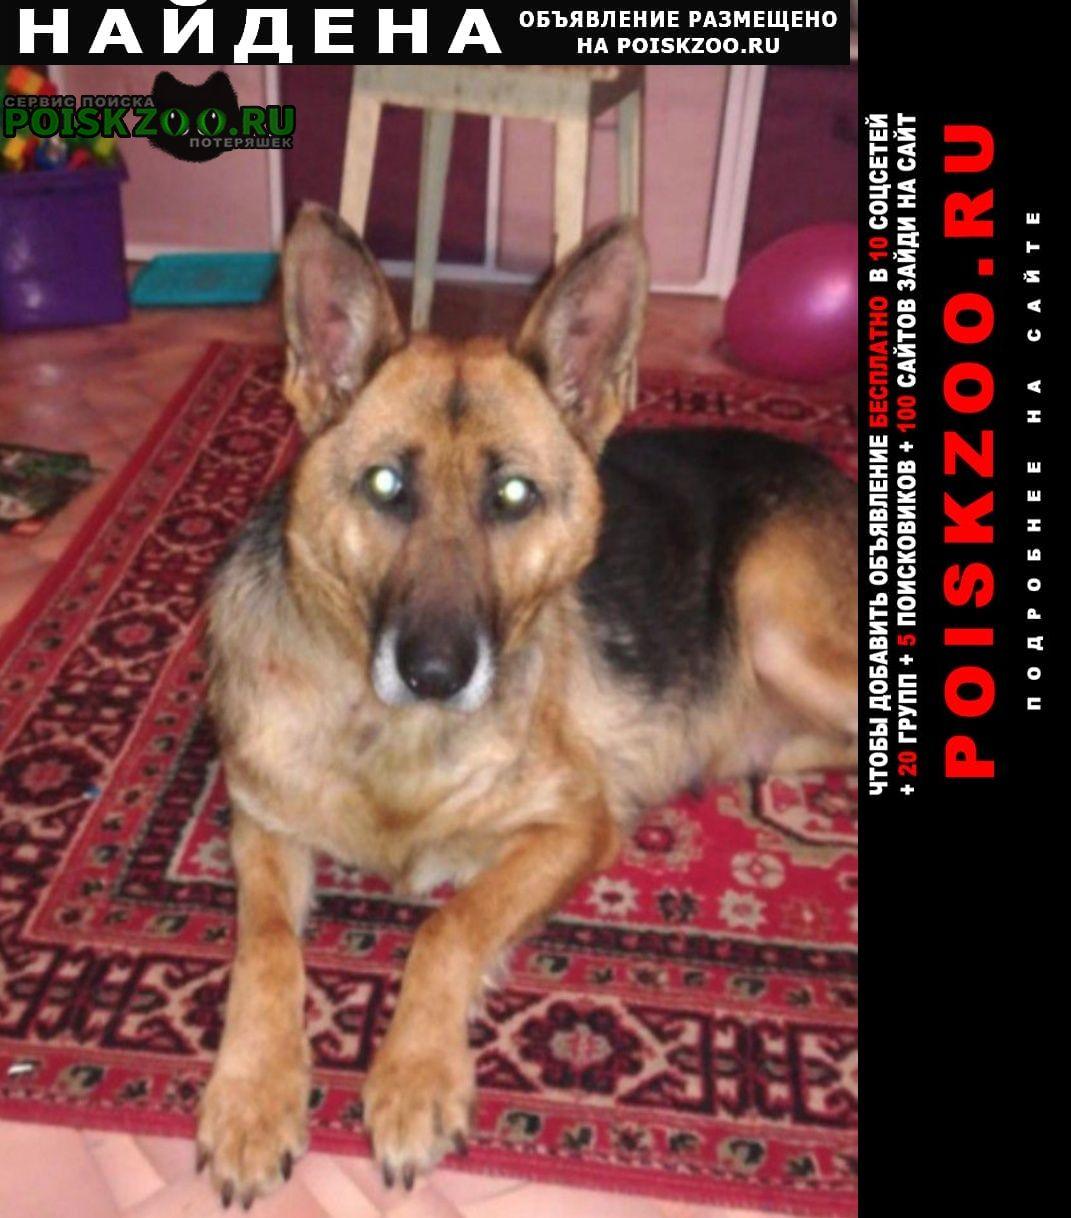 Найдена собака симферопольское шоссе овчарка сука Москва